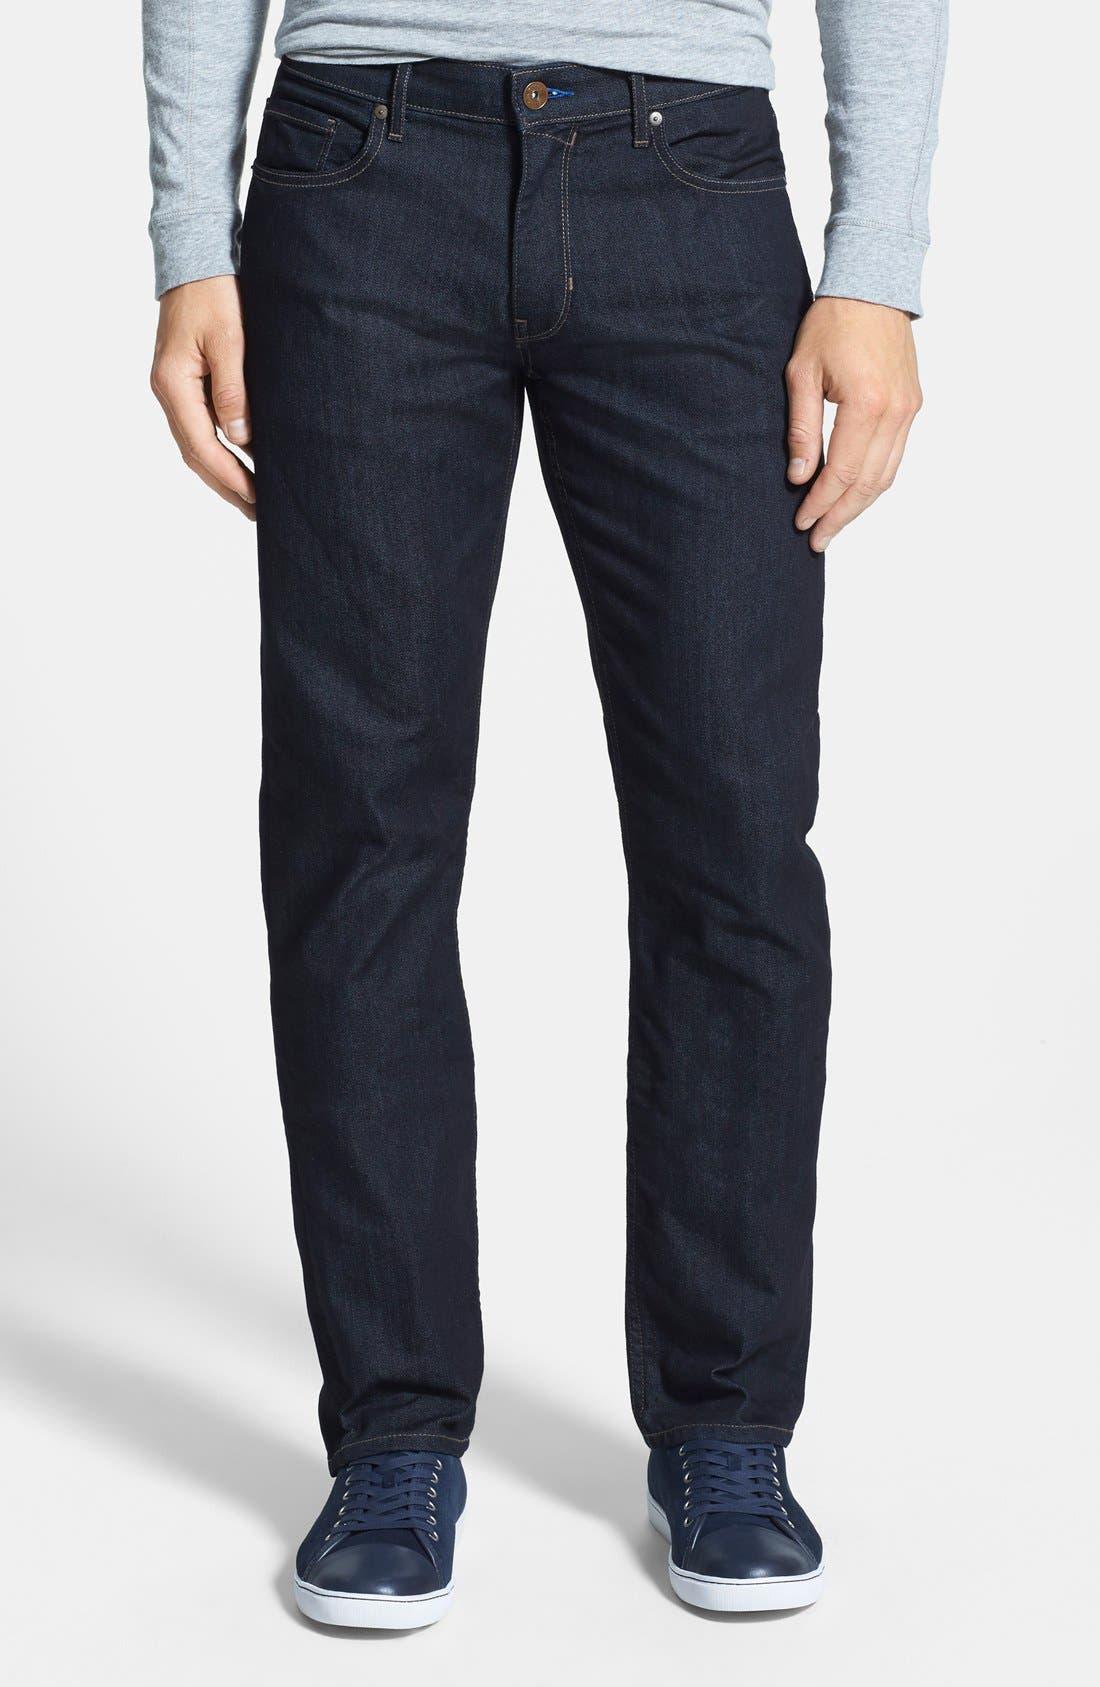 'Normandie' Straight Leg Jeans,                             Main thumbnail 1, color,                             400